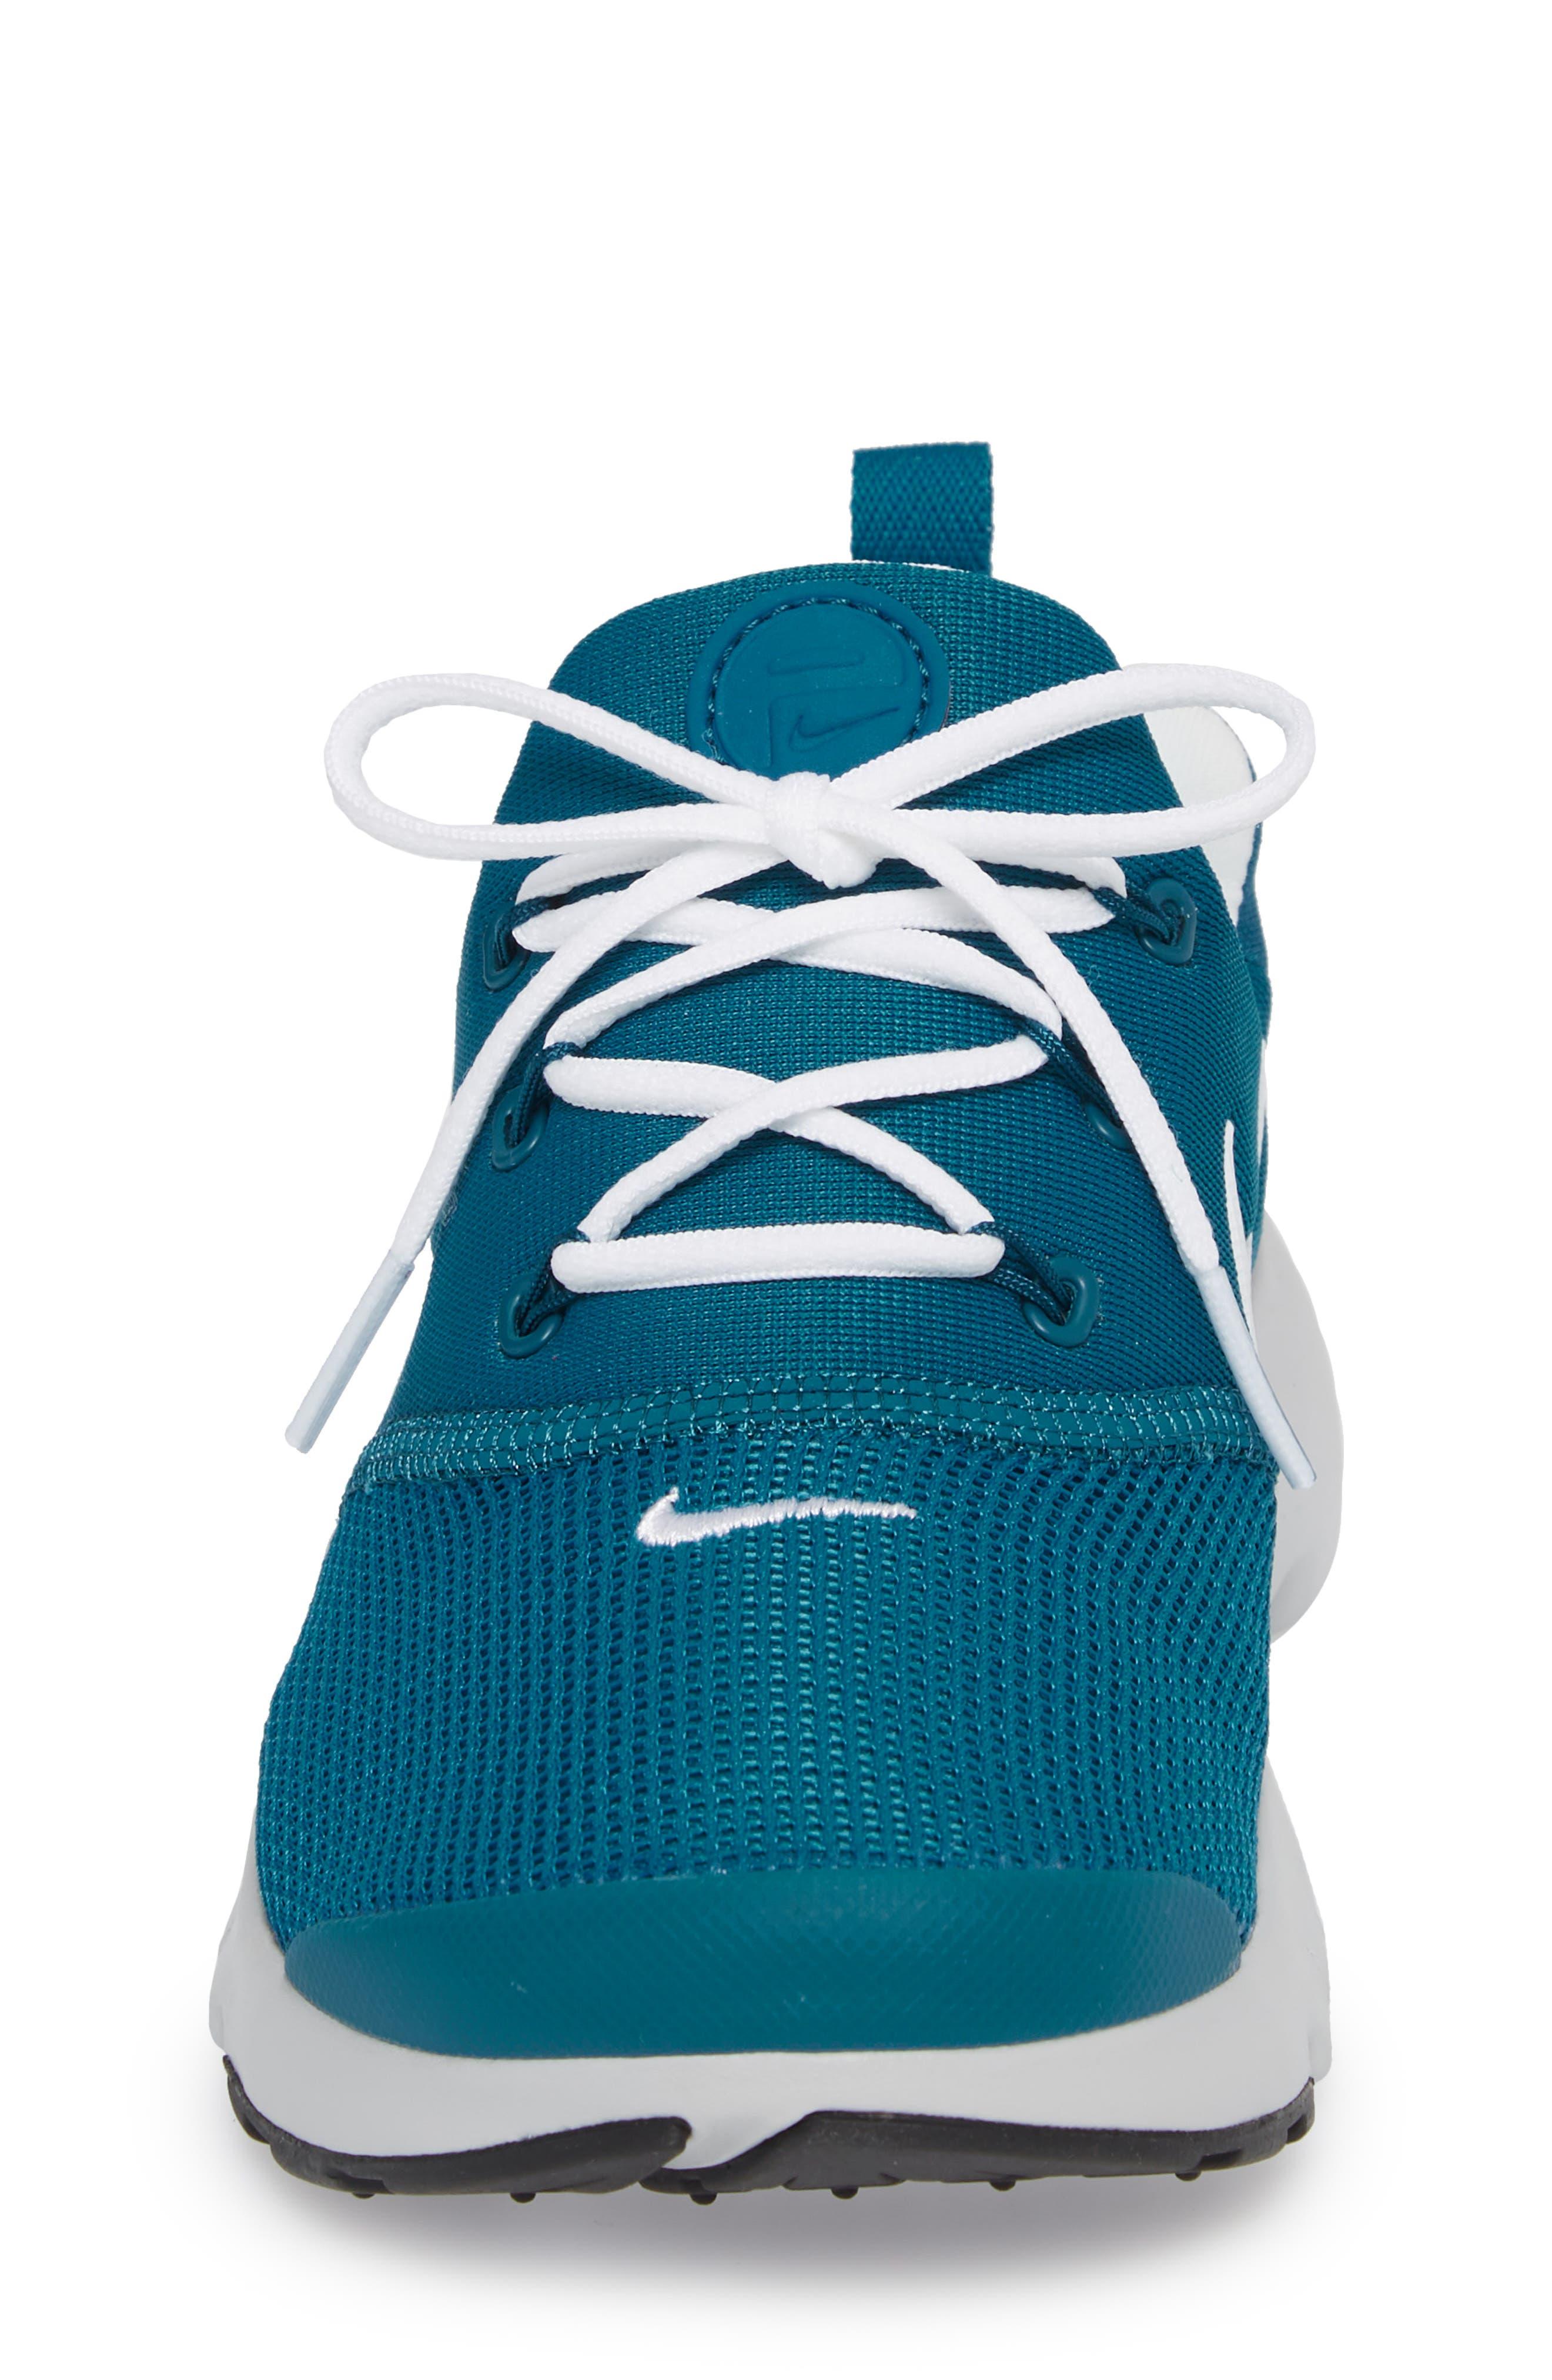 Presto Fly Sneaker,                             Alternate thumbnail 4, color,                             Green Abyss/ Platinum/ Black